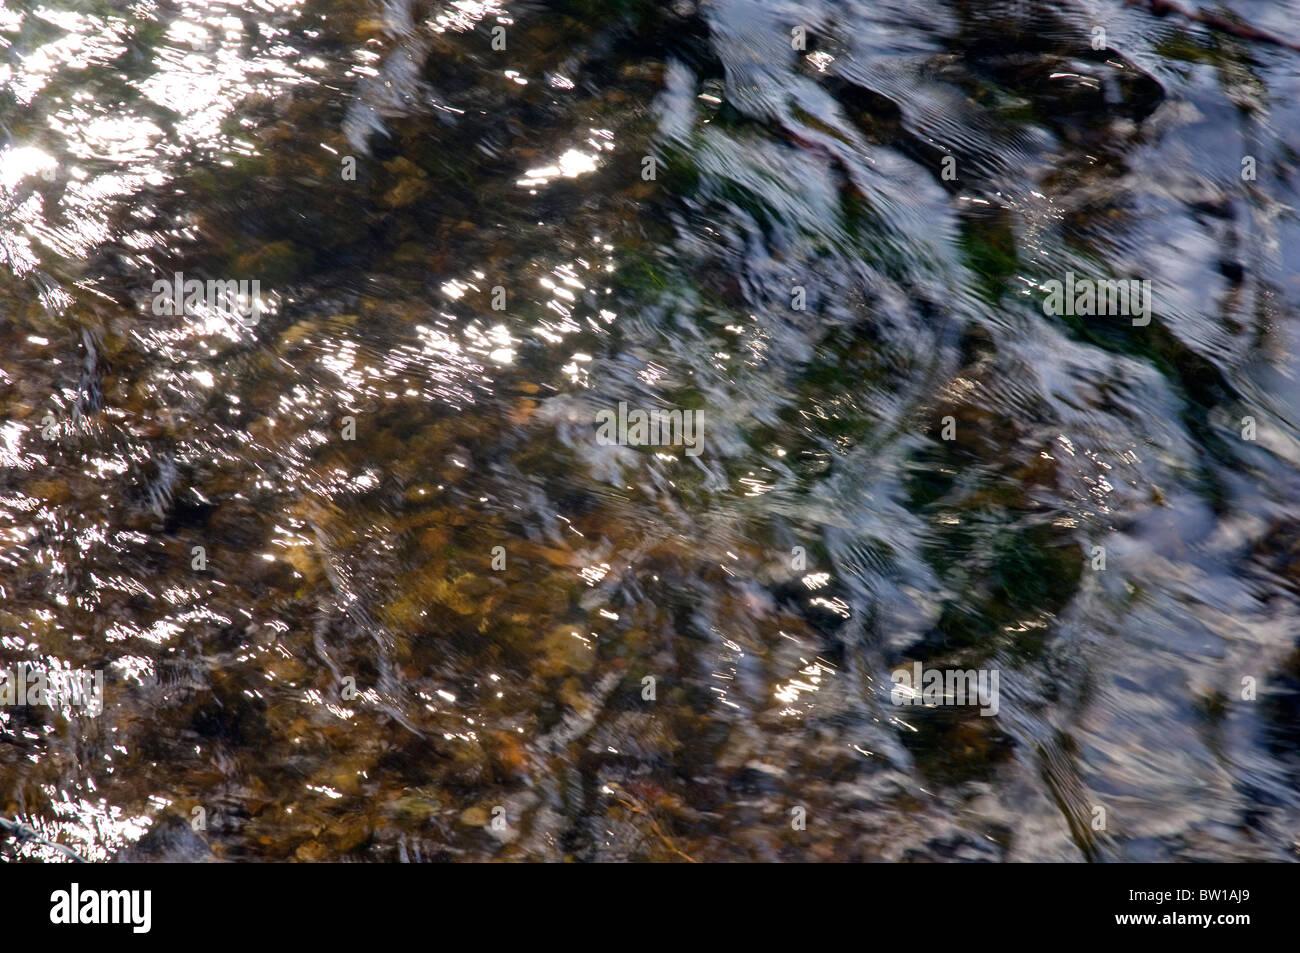 Dappled sunlight on a Flowing Stream - Stock Image